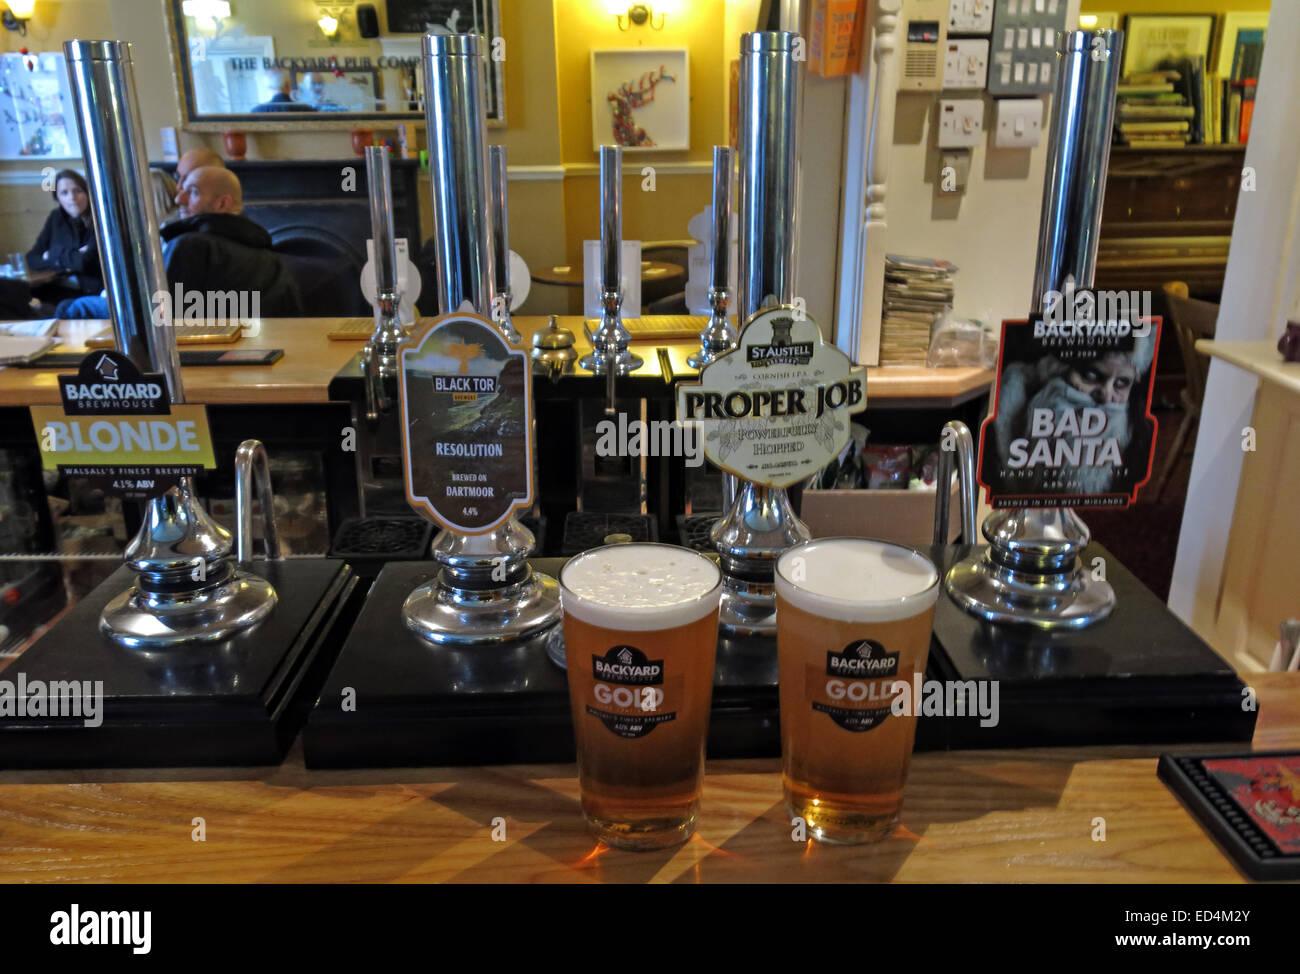 Laden Sie dieses Alamy Stockfoto Backhouse Brauerei Walsall Ales auf bar at The Fountain, senken, Forster Straße, Walsall, West Midlands, England, UK - ED4M2Y